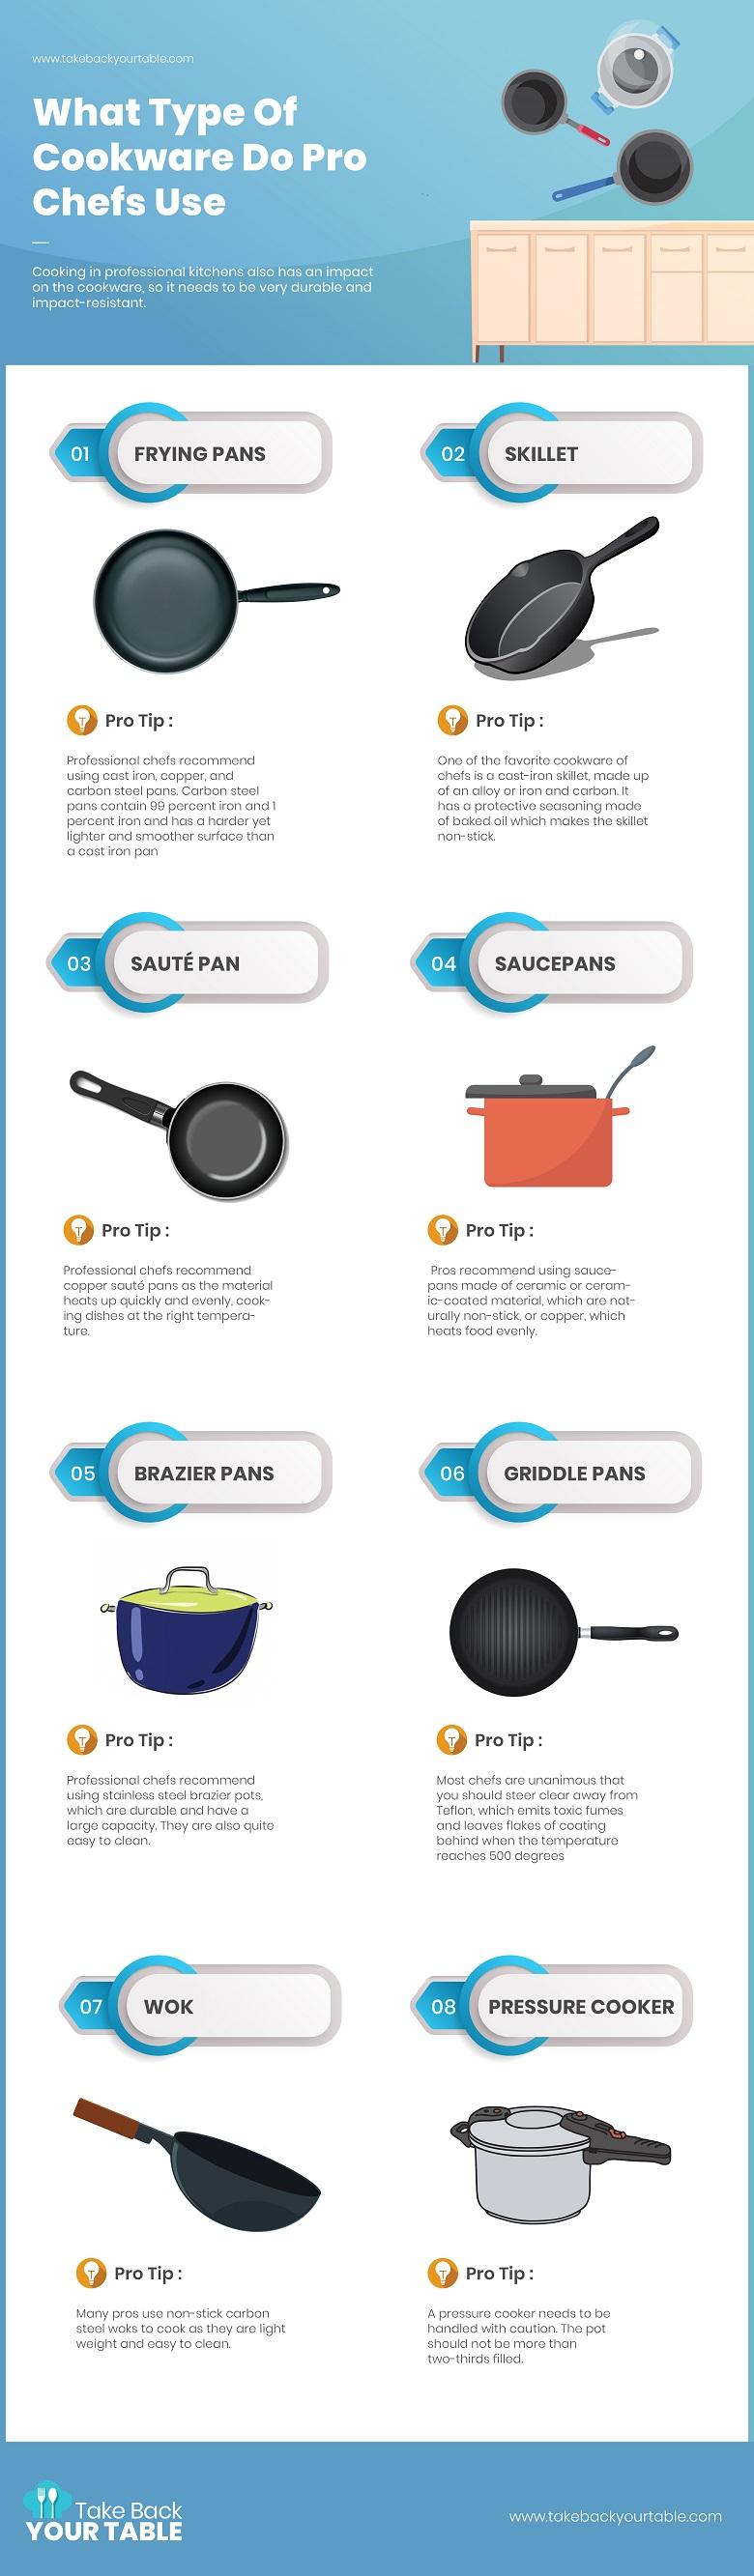 Chefs Cookware